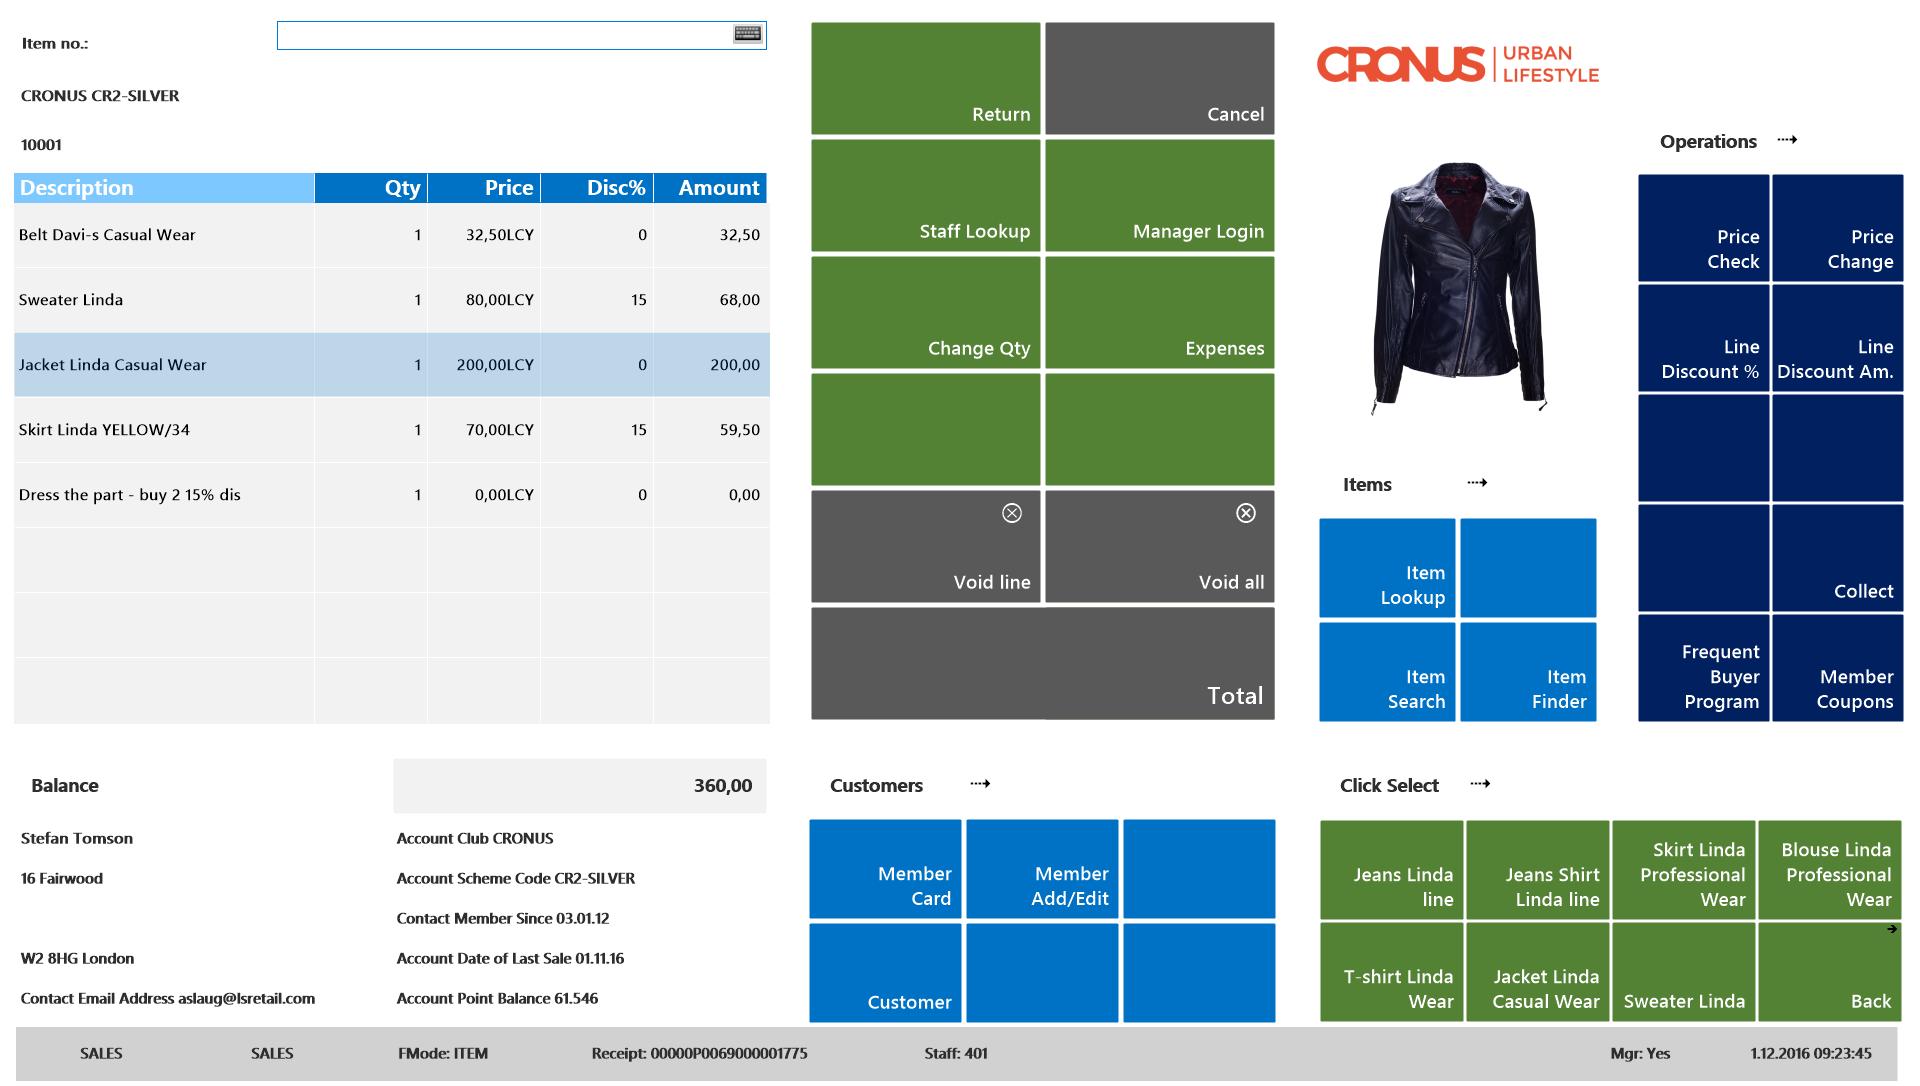 LS Retail Software - 2